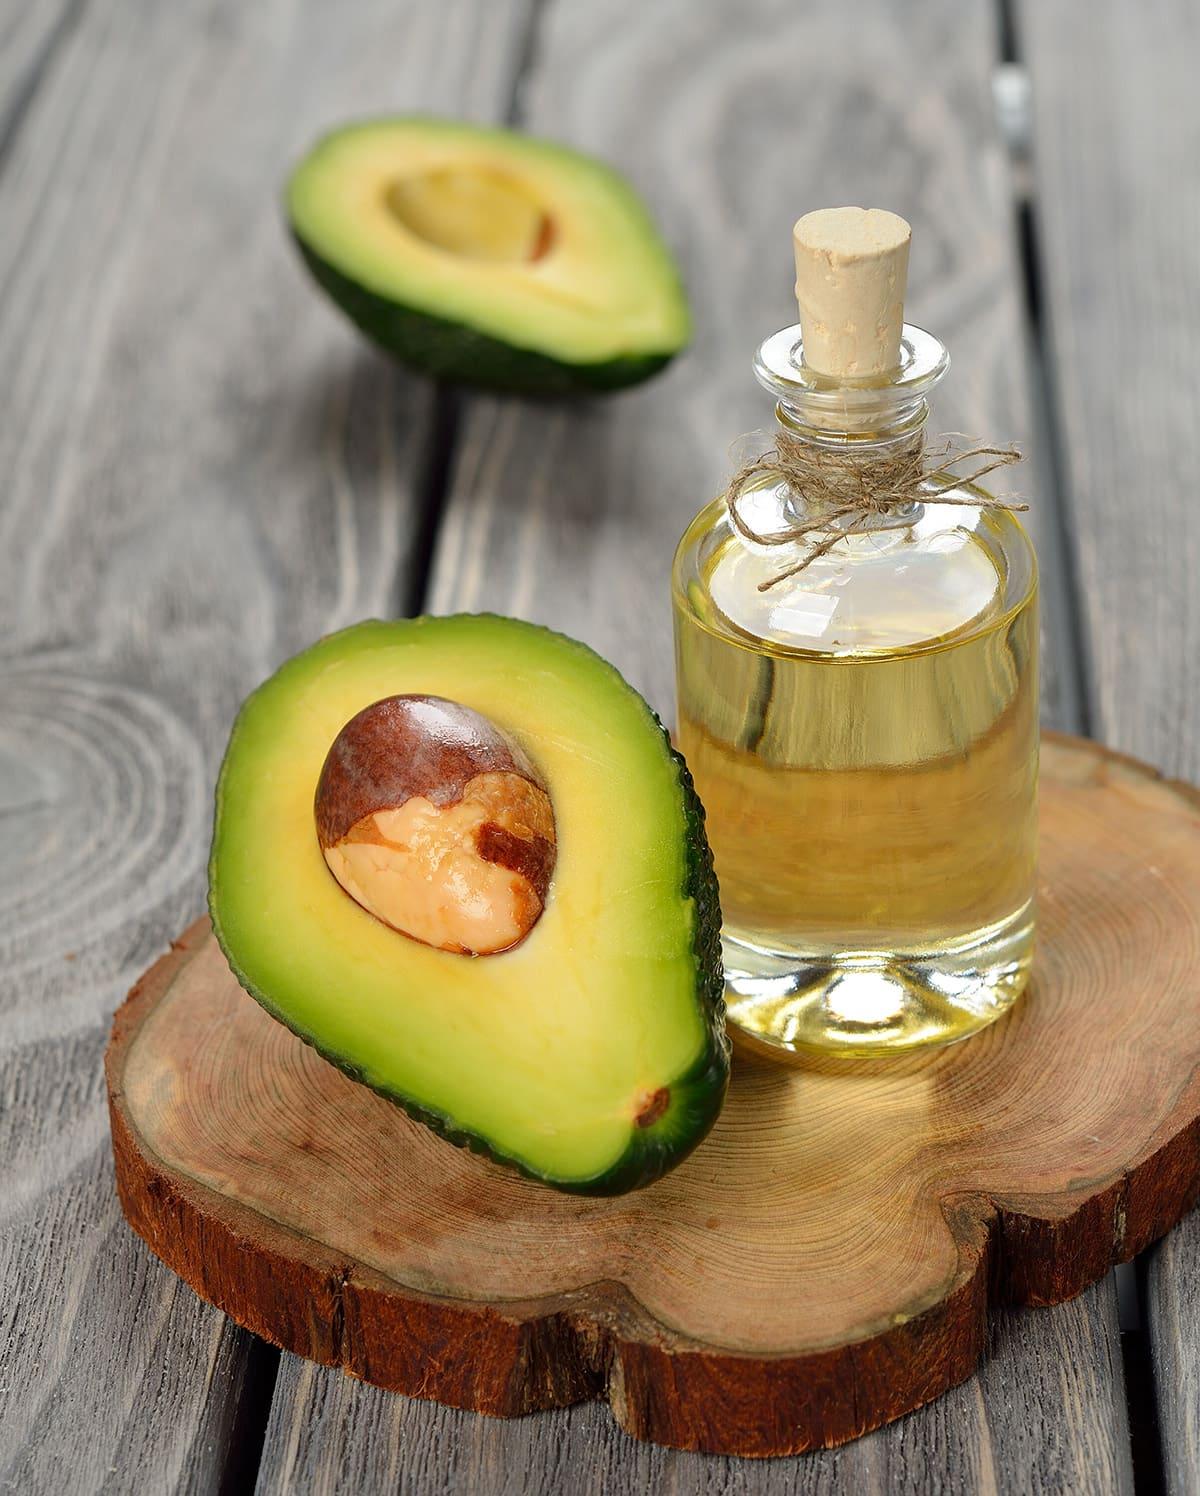 avocado oil with avocado on wooden backgound